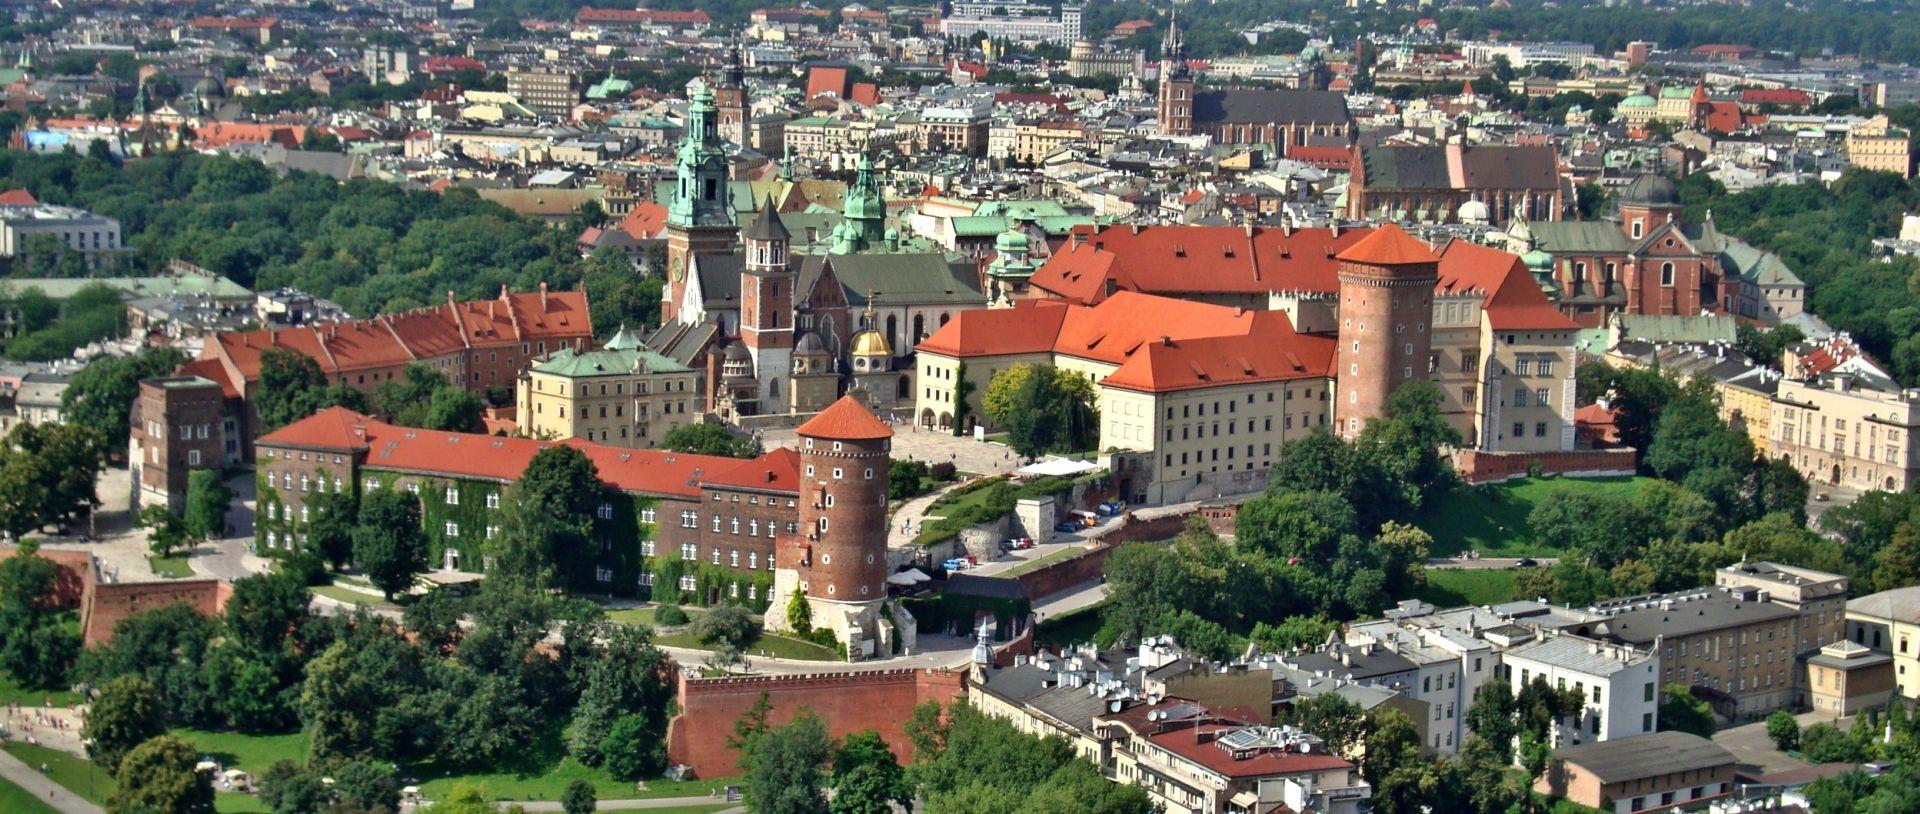 "Poljska pozvala na razgovor njemačkog veleposlanika zbog ""protupoljskih izjava njemačkih političara"""